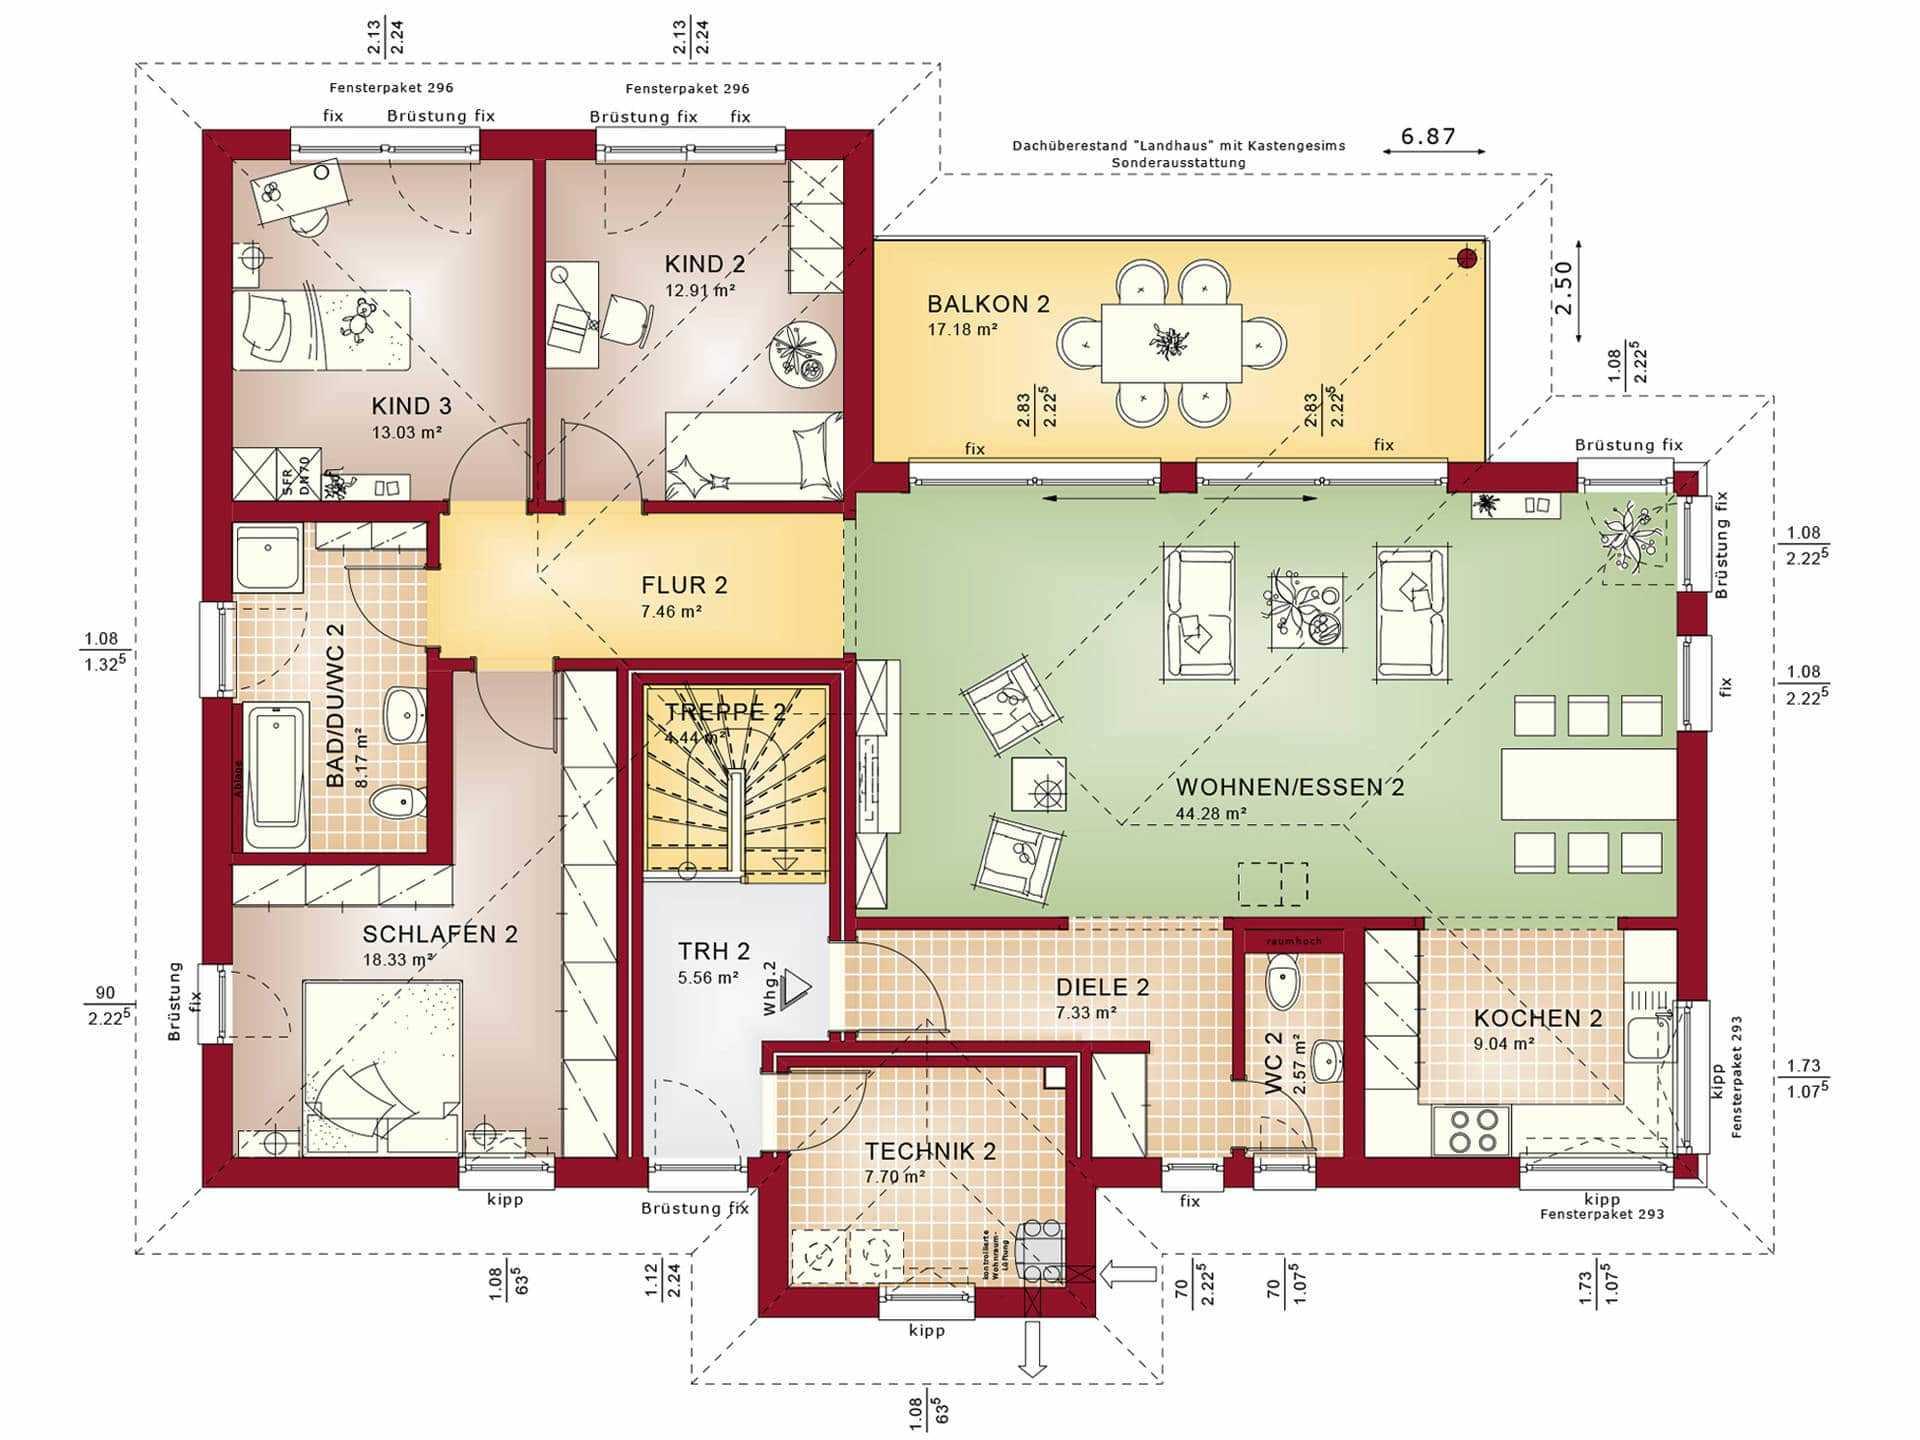 Hausbau, Haus Kalkulieren, Potsdam, Bungalow bauen in Potsdam, Berlin,